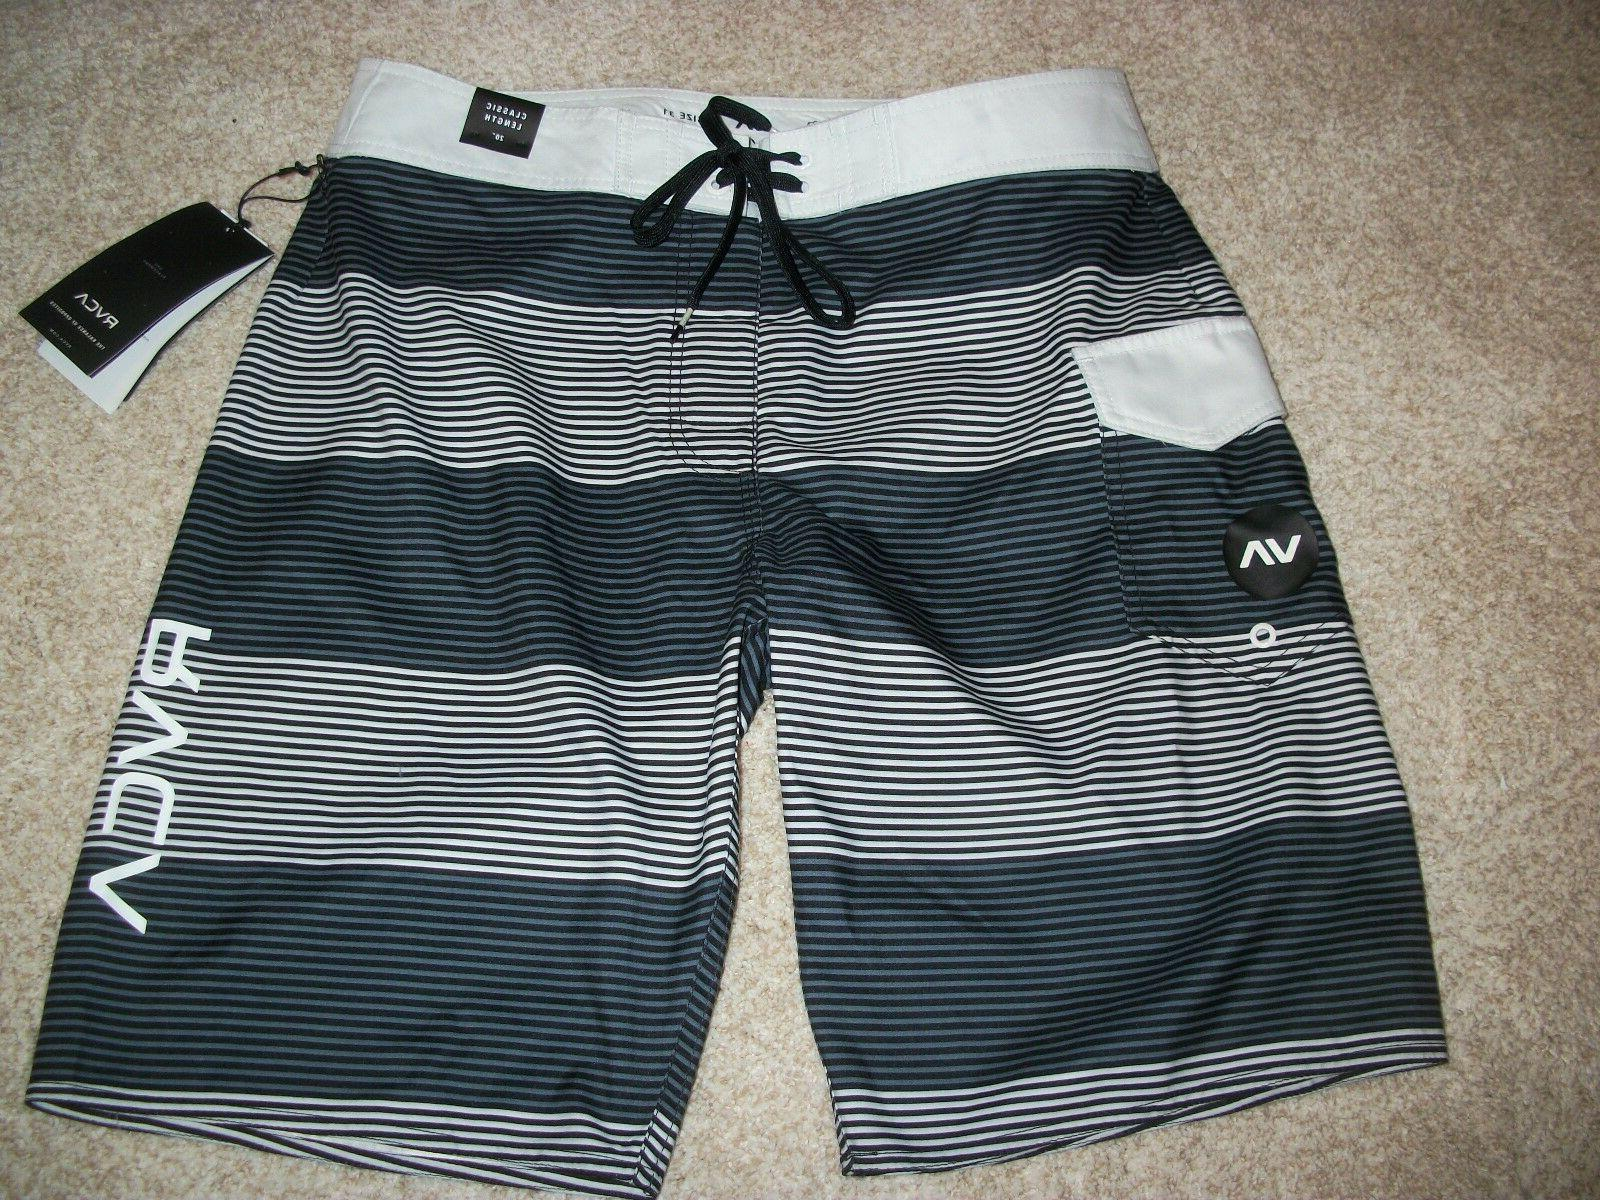 new nwt mens board shorts swim black